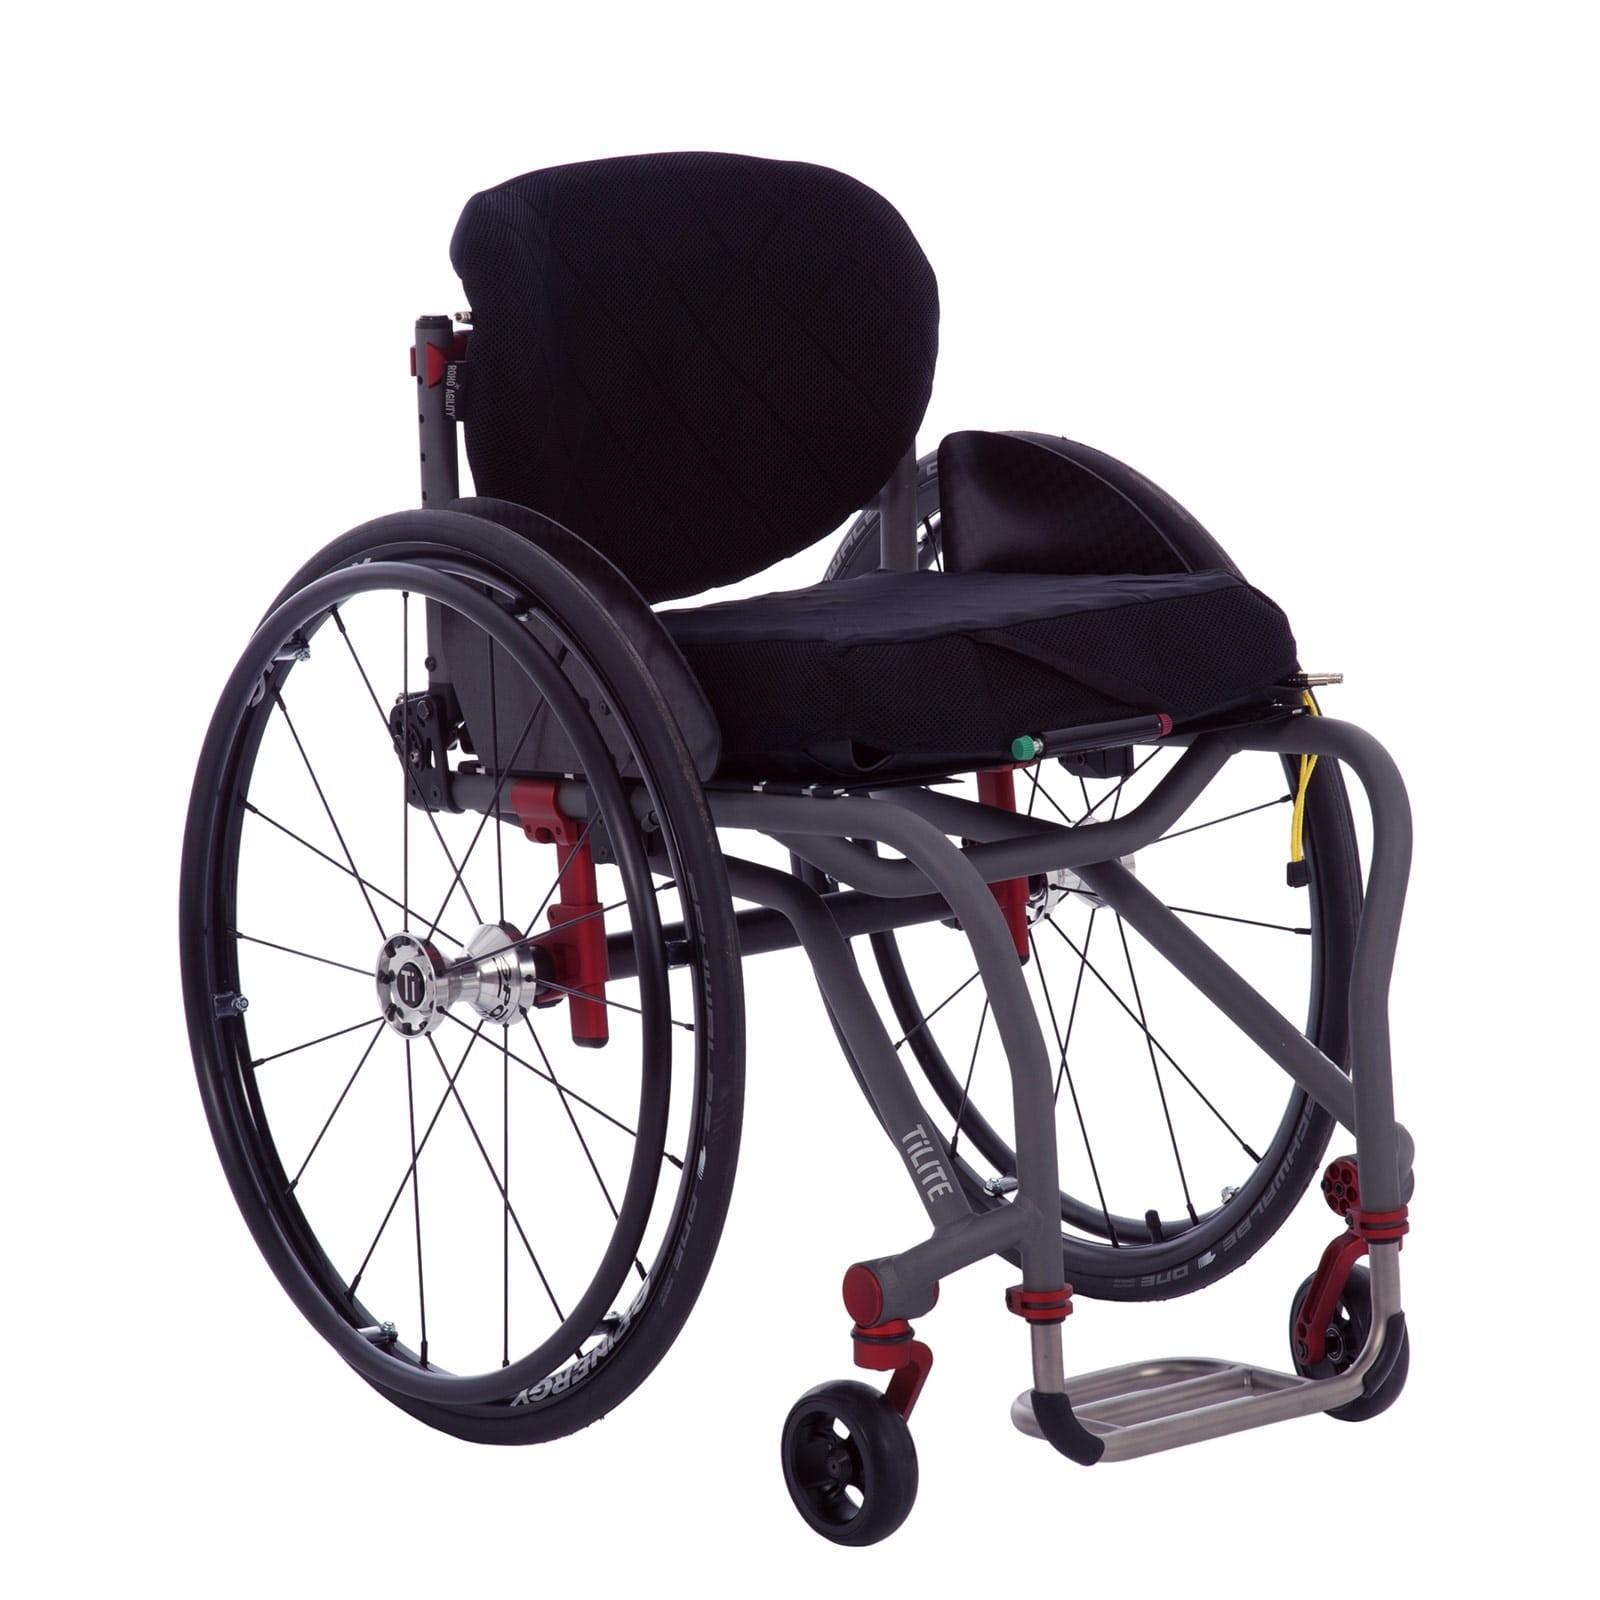 Deluxe Folding & Rigid Ultra Light Wheelchair for Rental